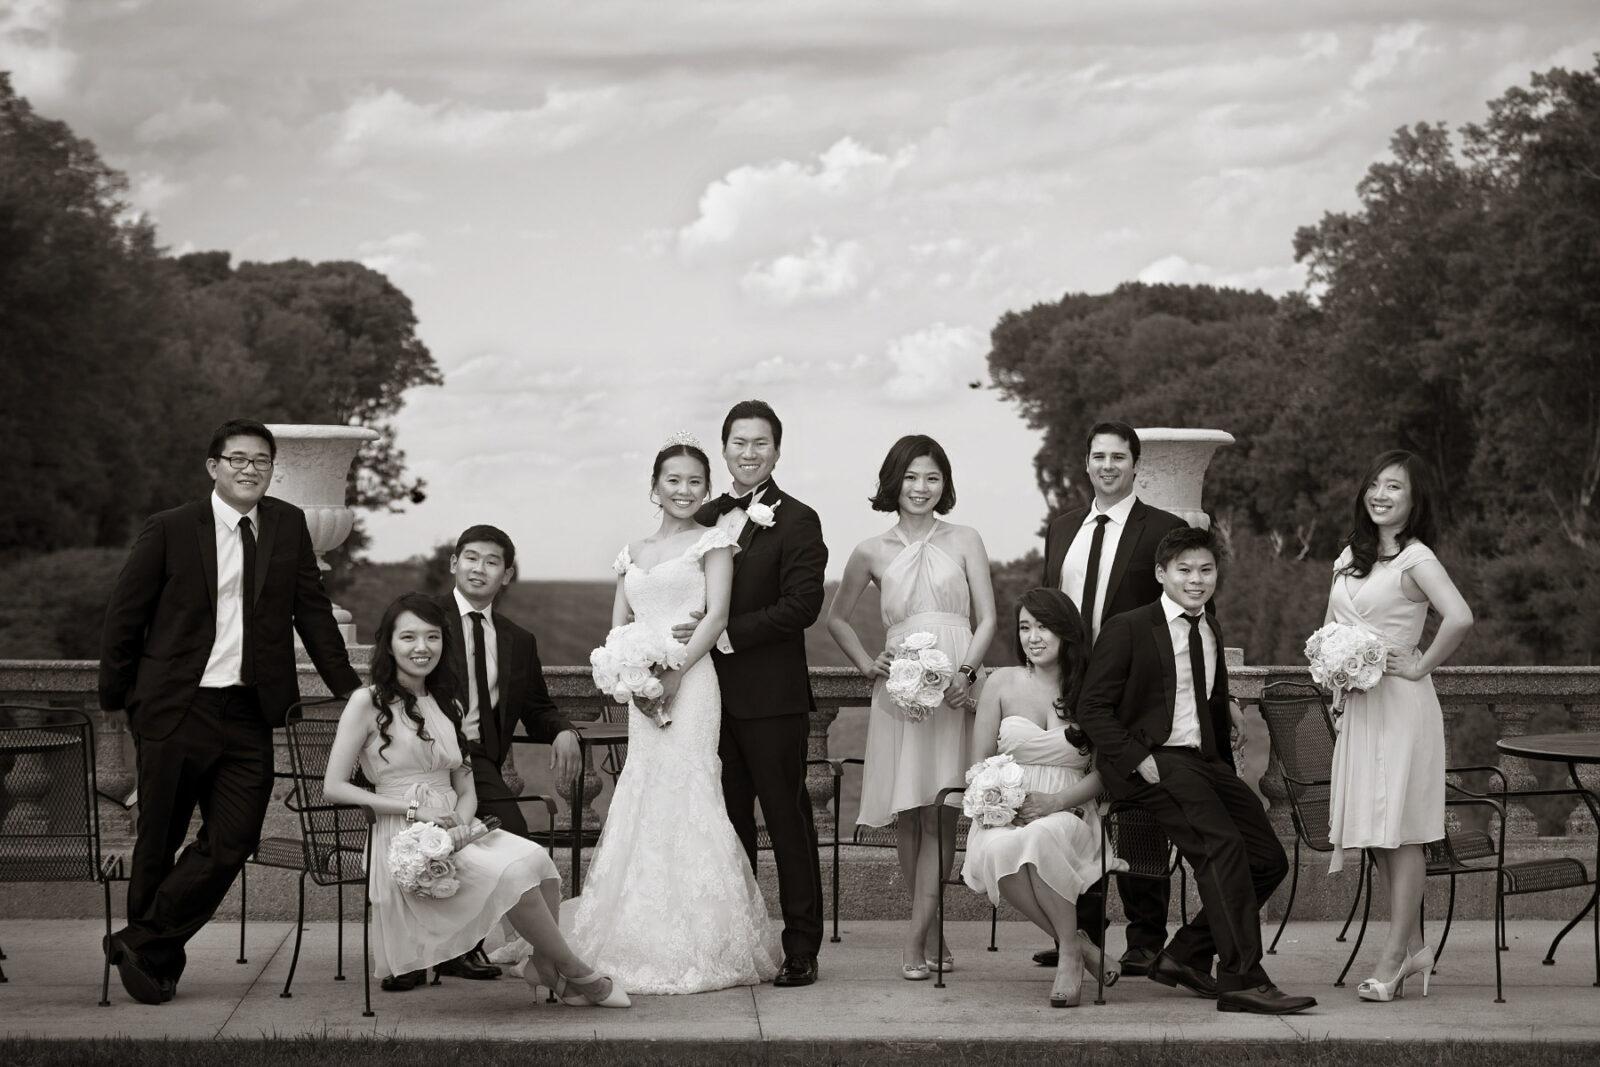 FUN WEDDING AT THE CRANE ESTATE WEDDING IPSWICH, MA